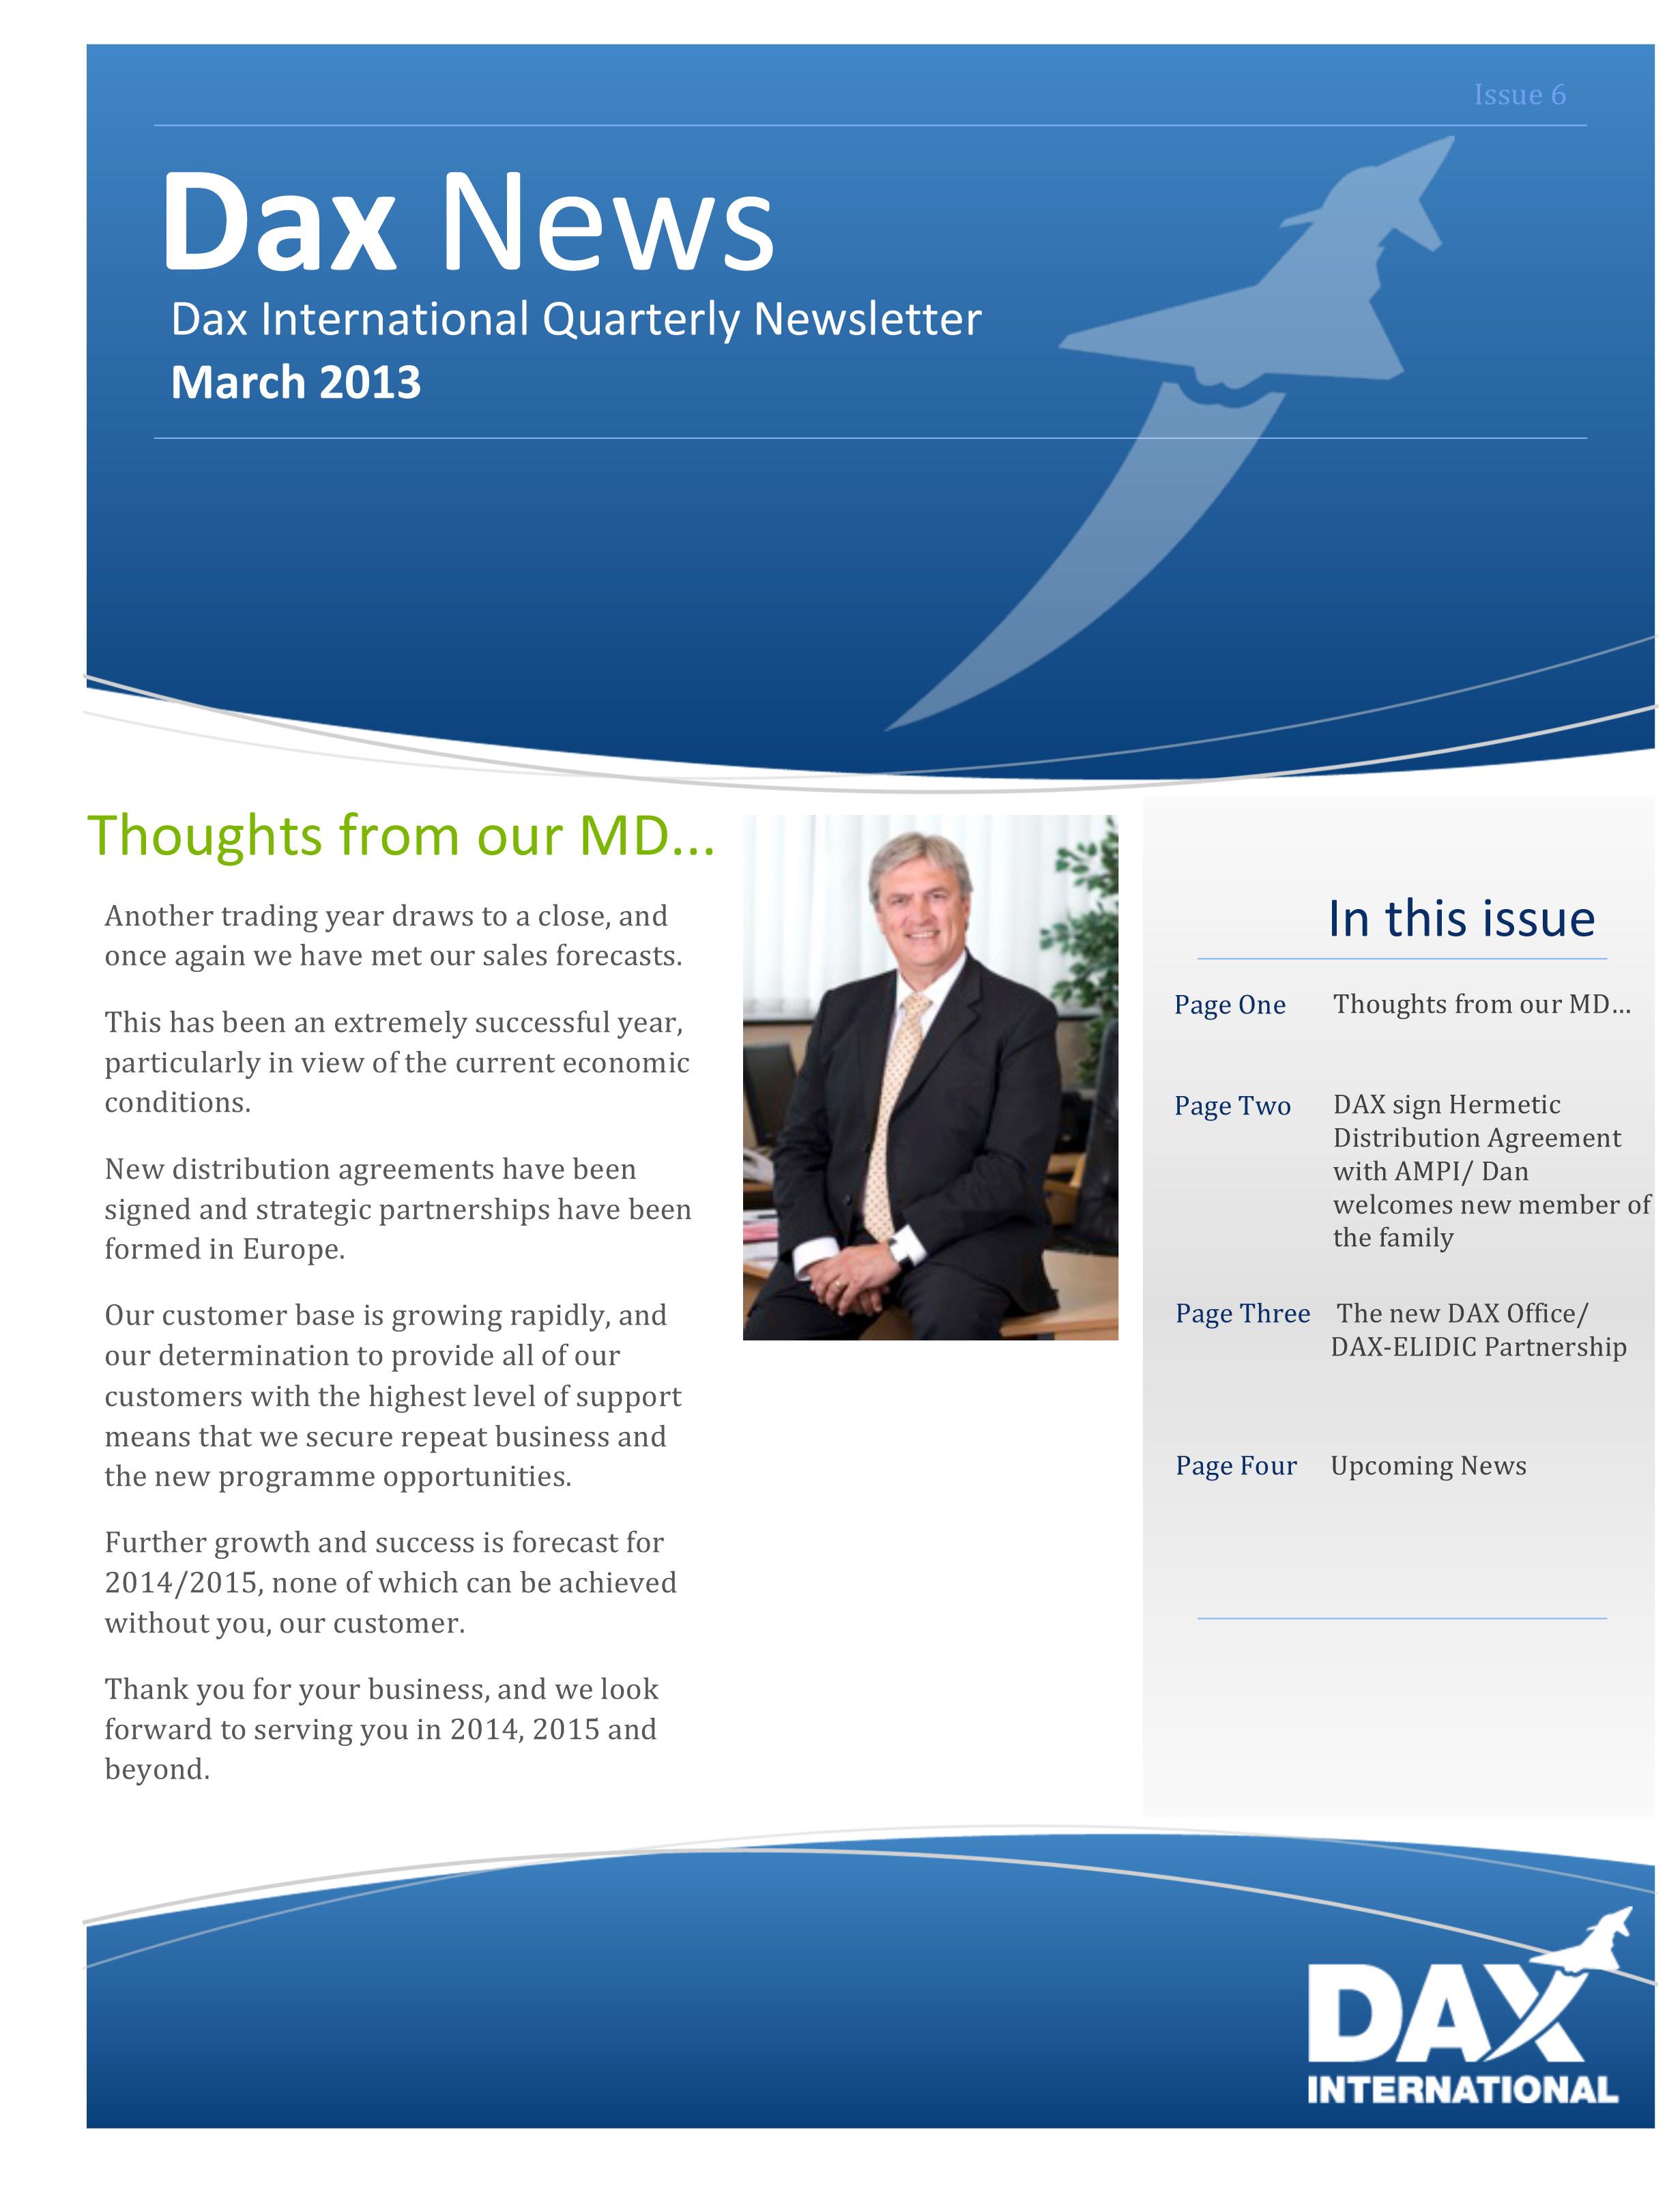 Microsoft Word - DAX Newsletter March 2013.docx